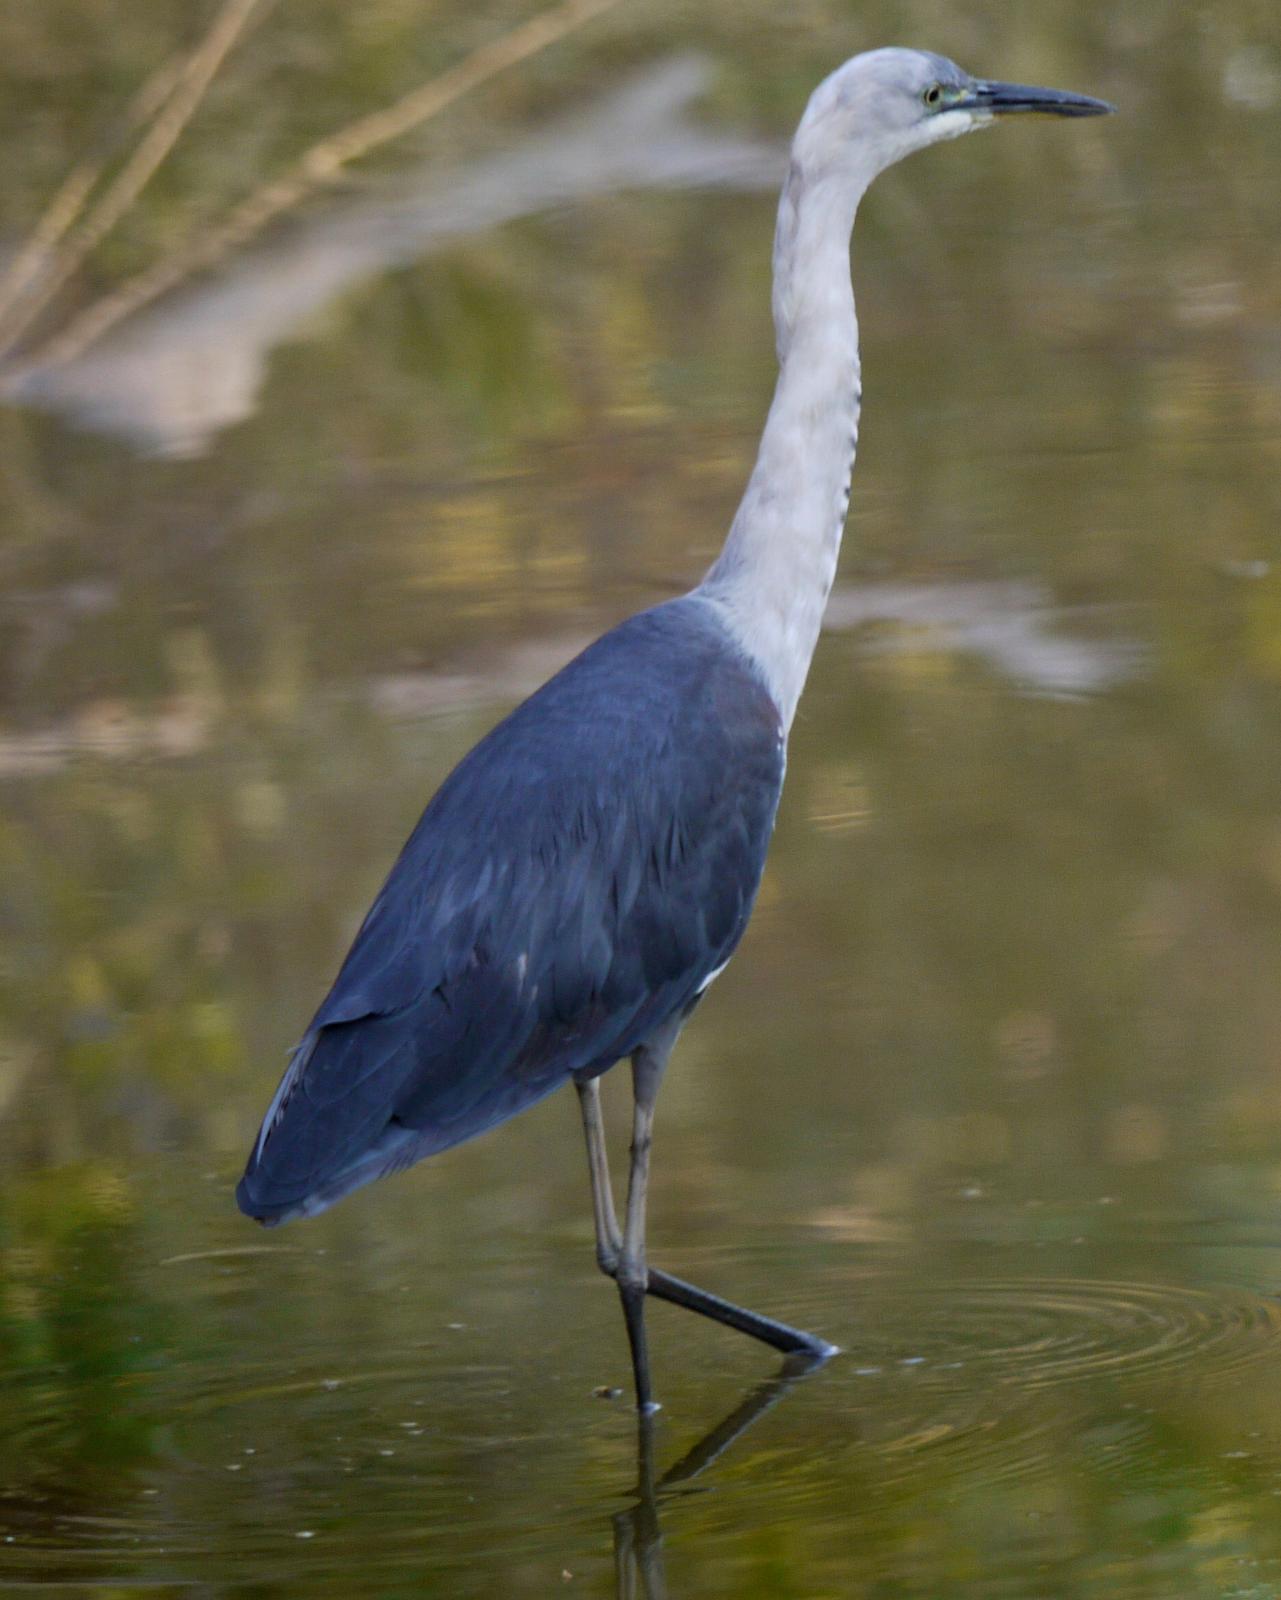 Pacific Heron Photo by Peter Lowe